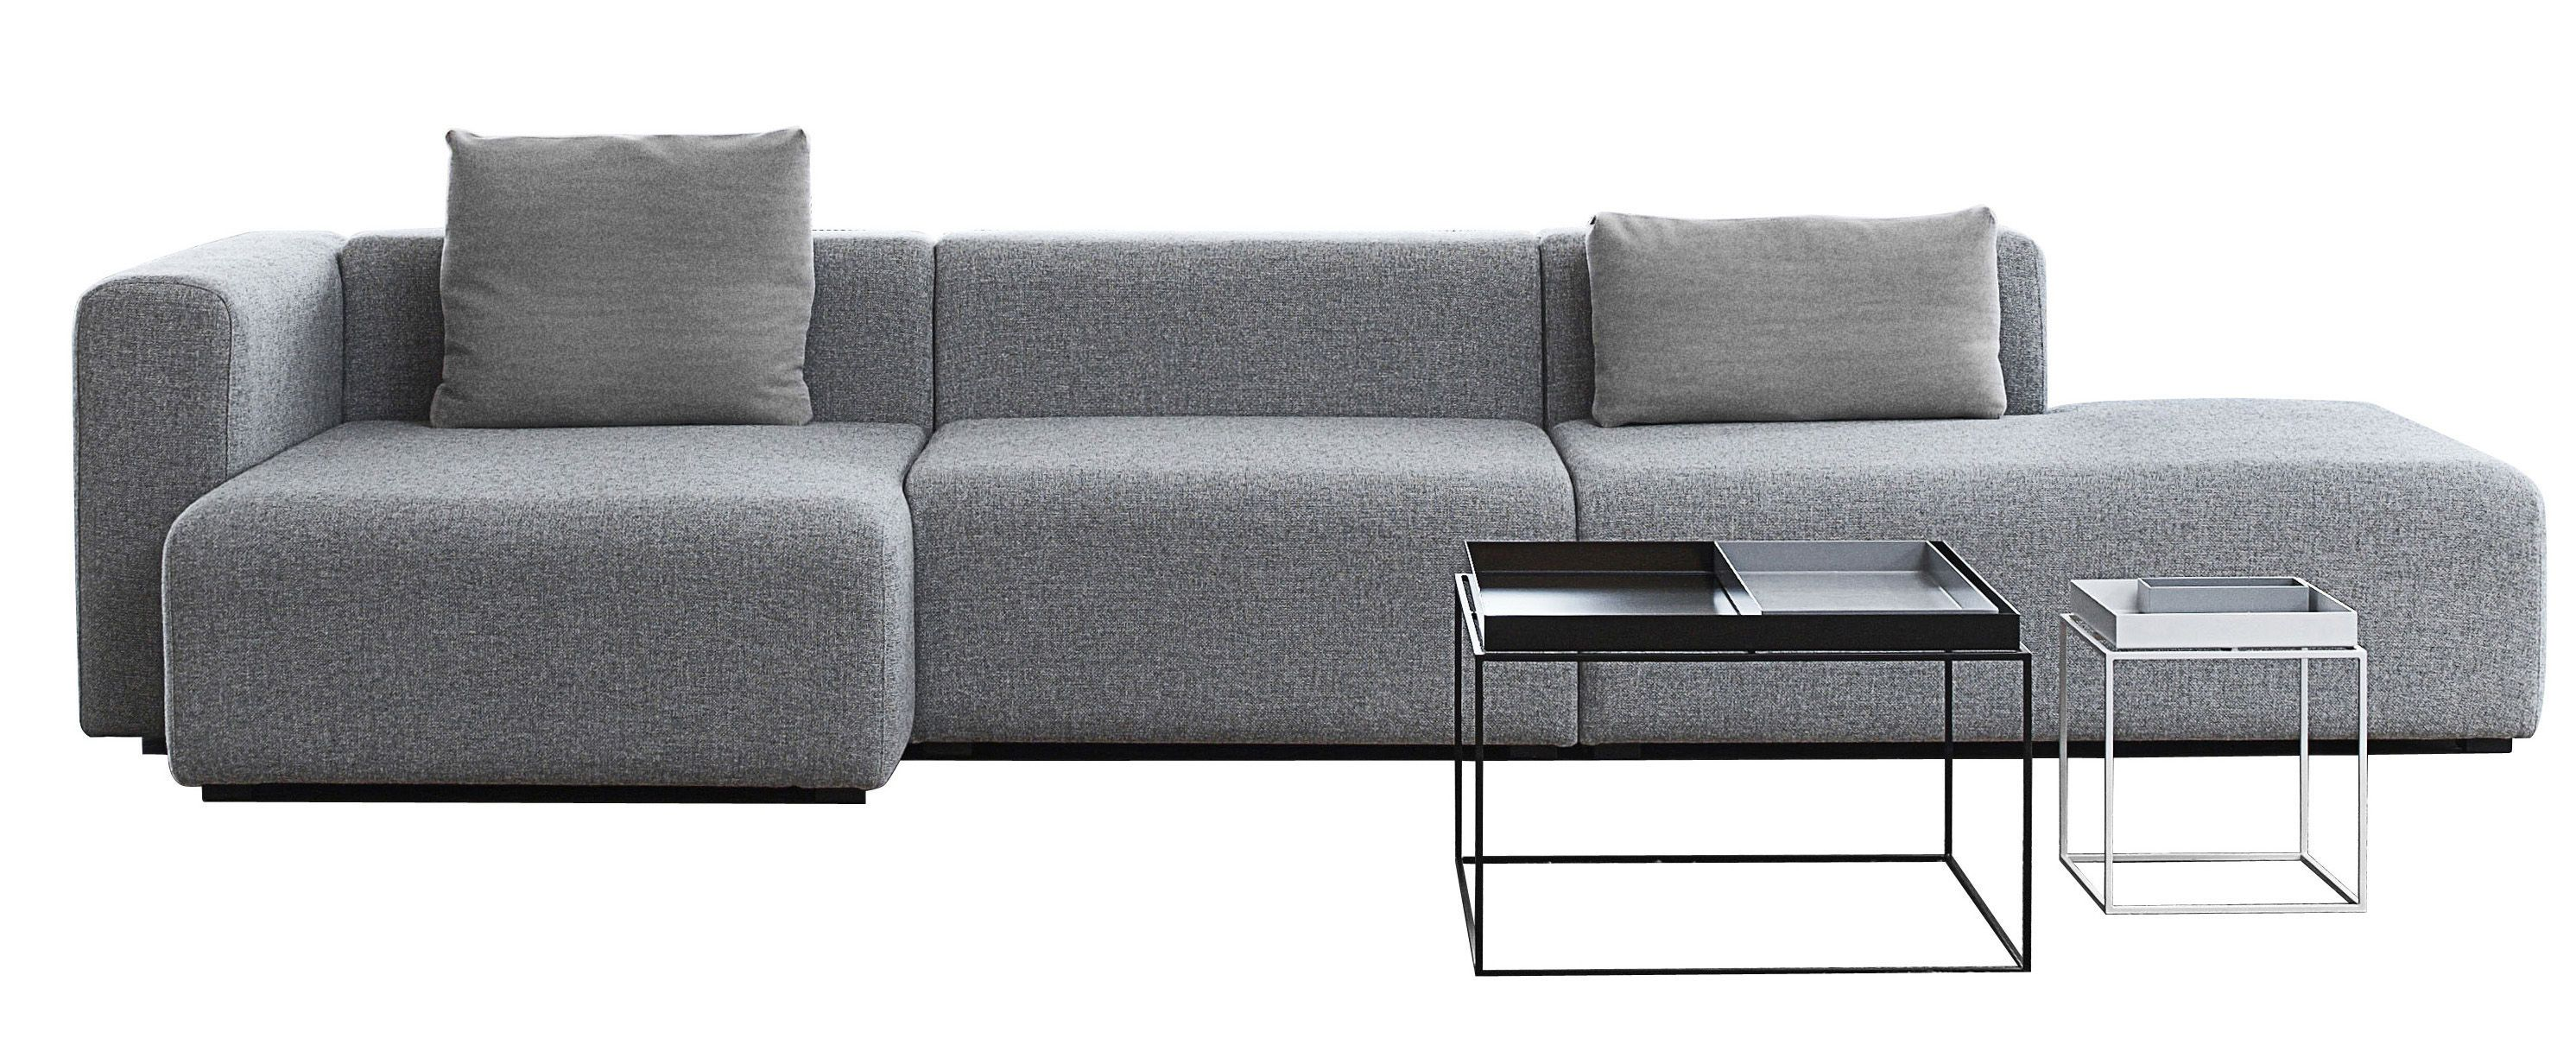 Hay Mags Lounge Sofa